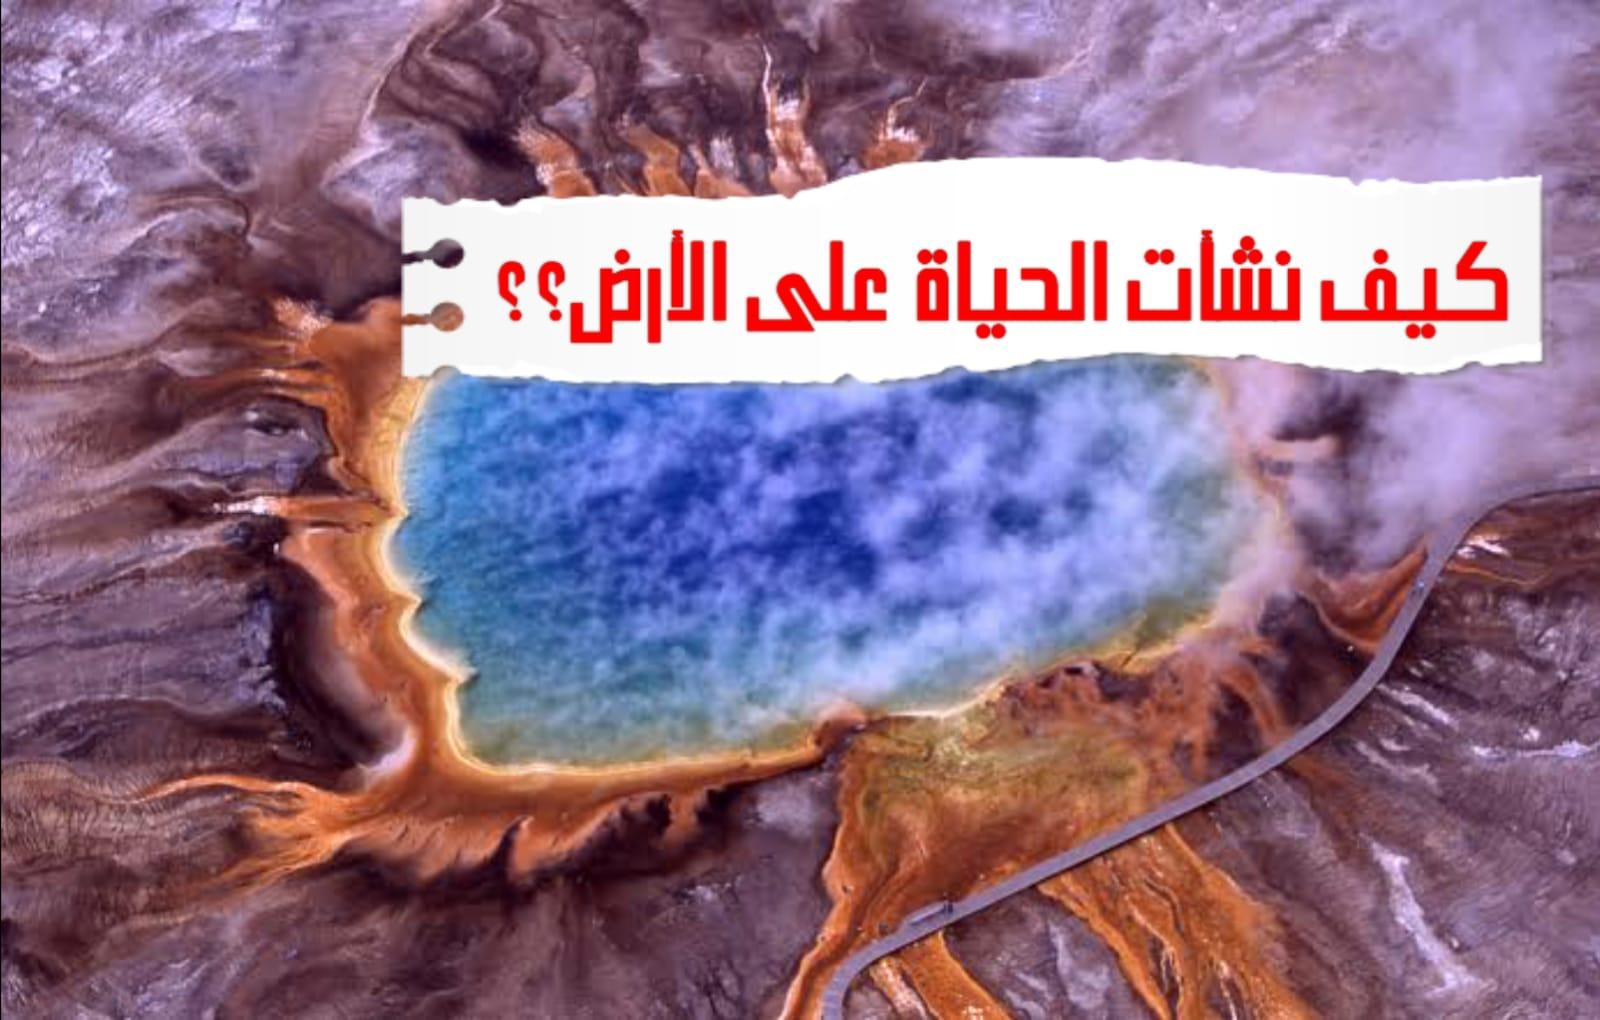 WhatsApp Image 2020 06 28 at 3.59.57 AM 2 - كيف نشأت الحياة على الأرض ؟